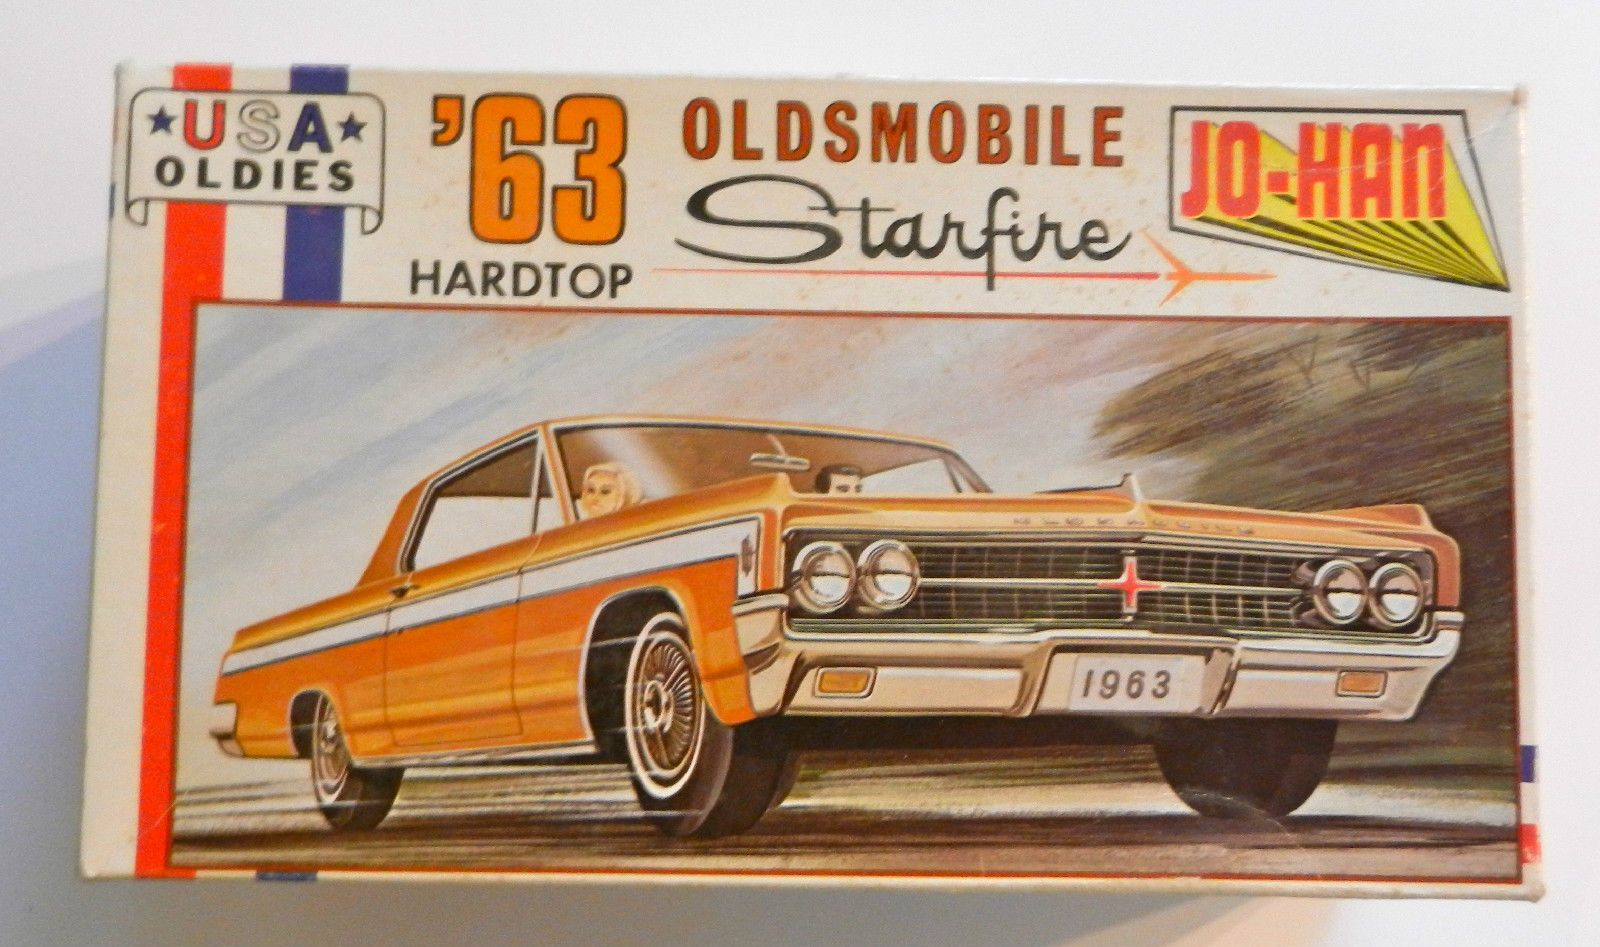 Jo-han \'63 oldsmobile starfire hardtop usa oldies 1:25th scale ...